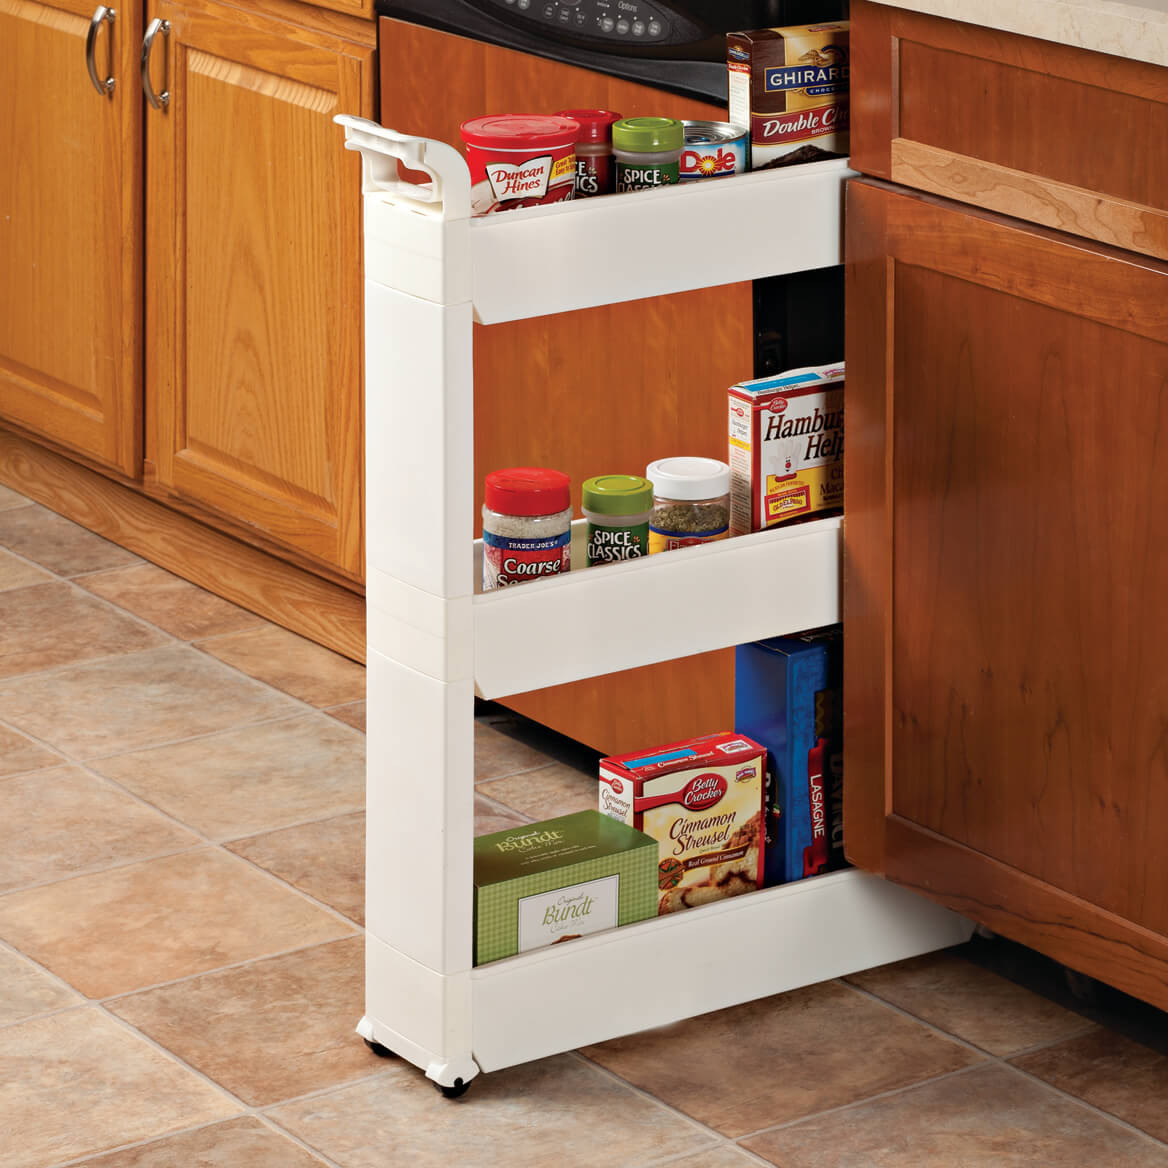 bruce 64 fl oz hardwood floor cleaner of non slip insulated counter mat non slip kitchen mat miles kimball for slim storage cart 350746 slim storage cart 350746